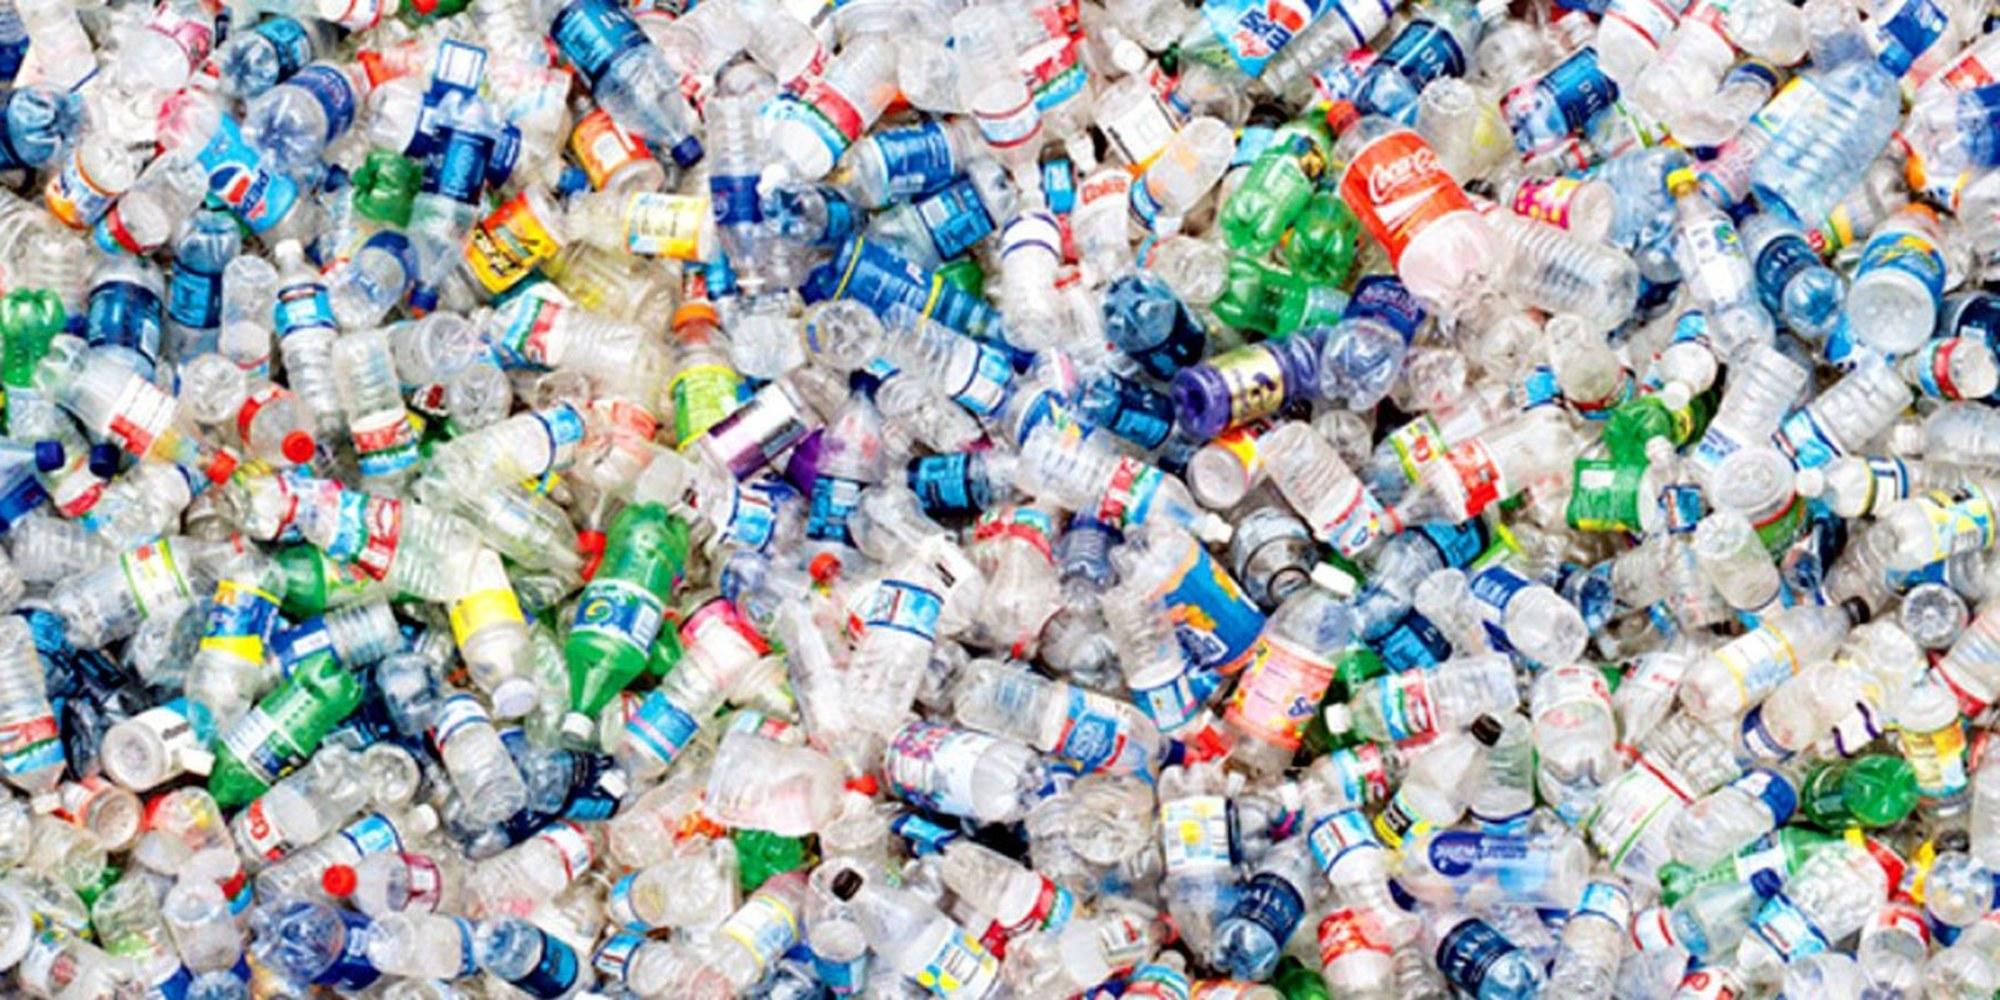 1.5 million tonnes plastic waste threatening food quality, human health, others